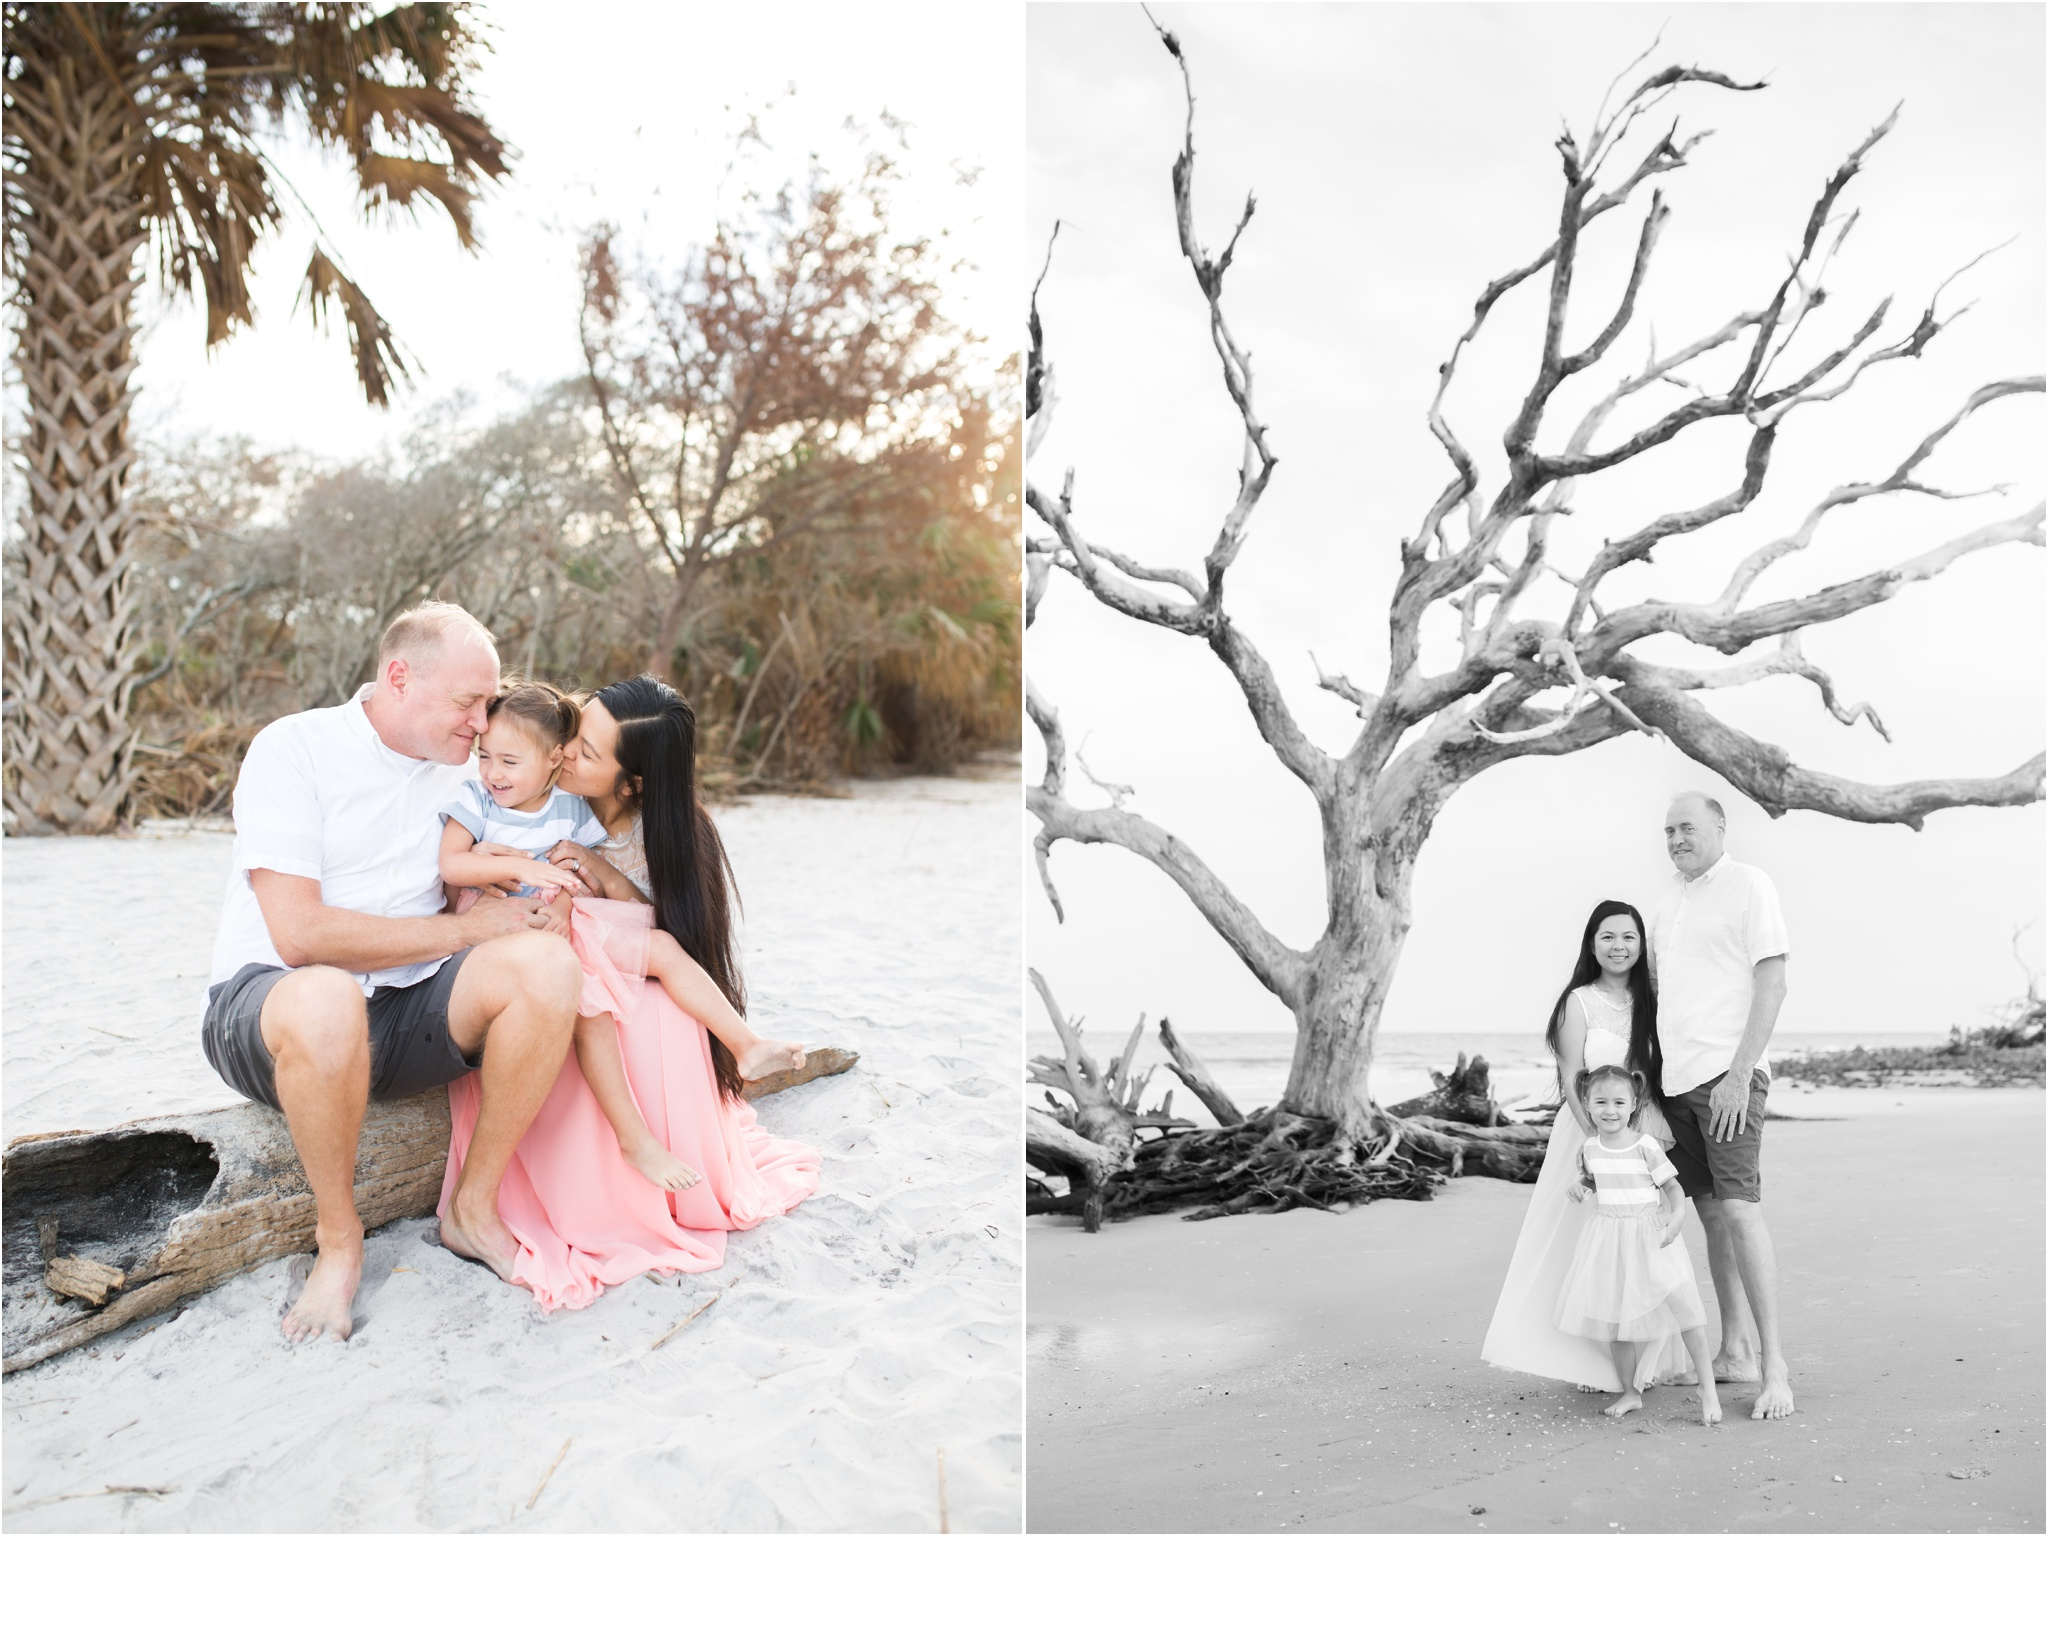 Rainey_Gregg_Photography_St._Simons_Island_Georgia_California_Wedding_Portrait_Photography_0406.jpg